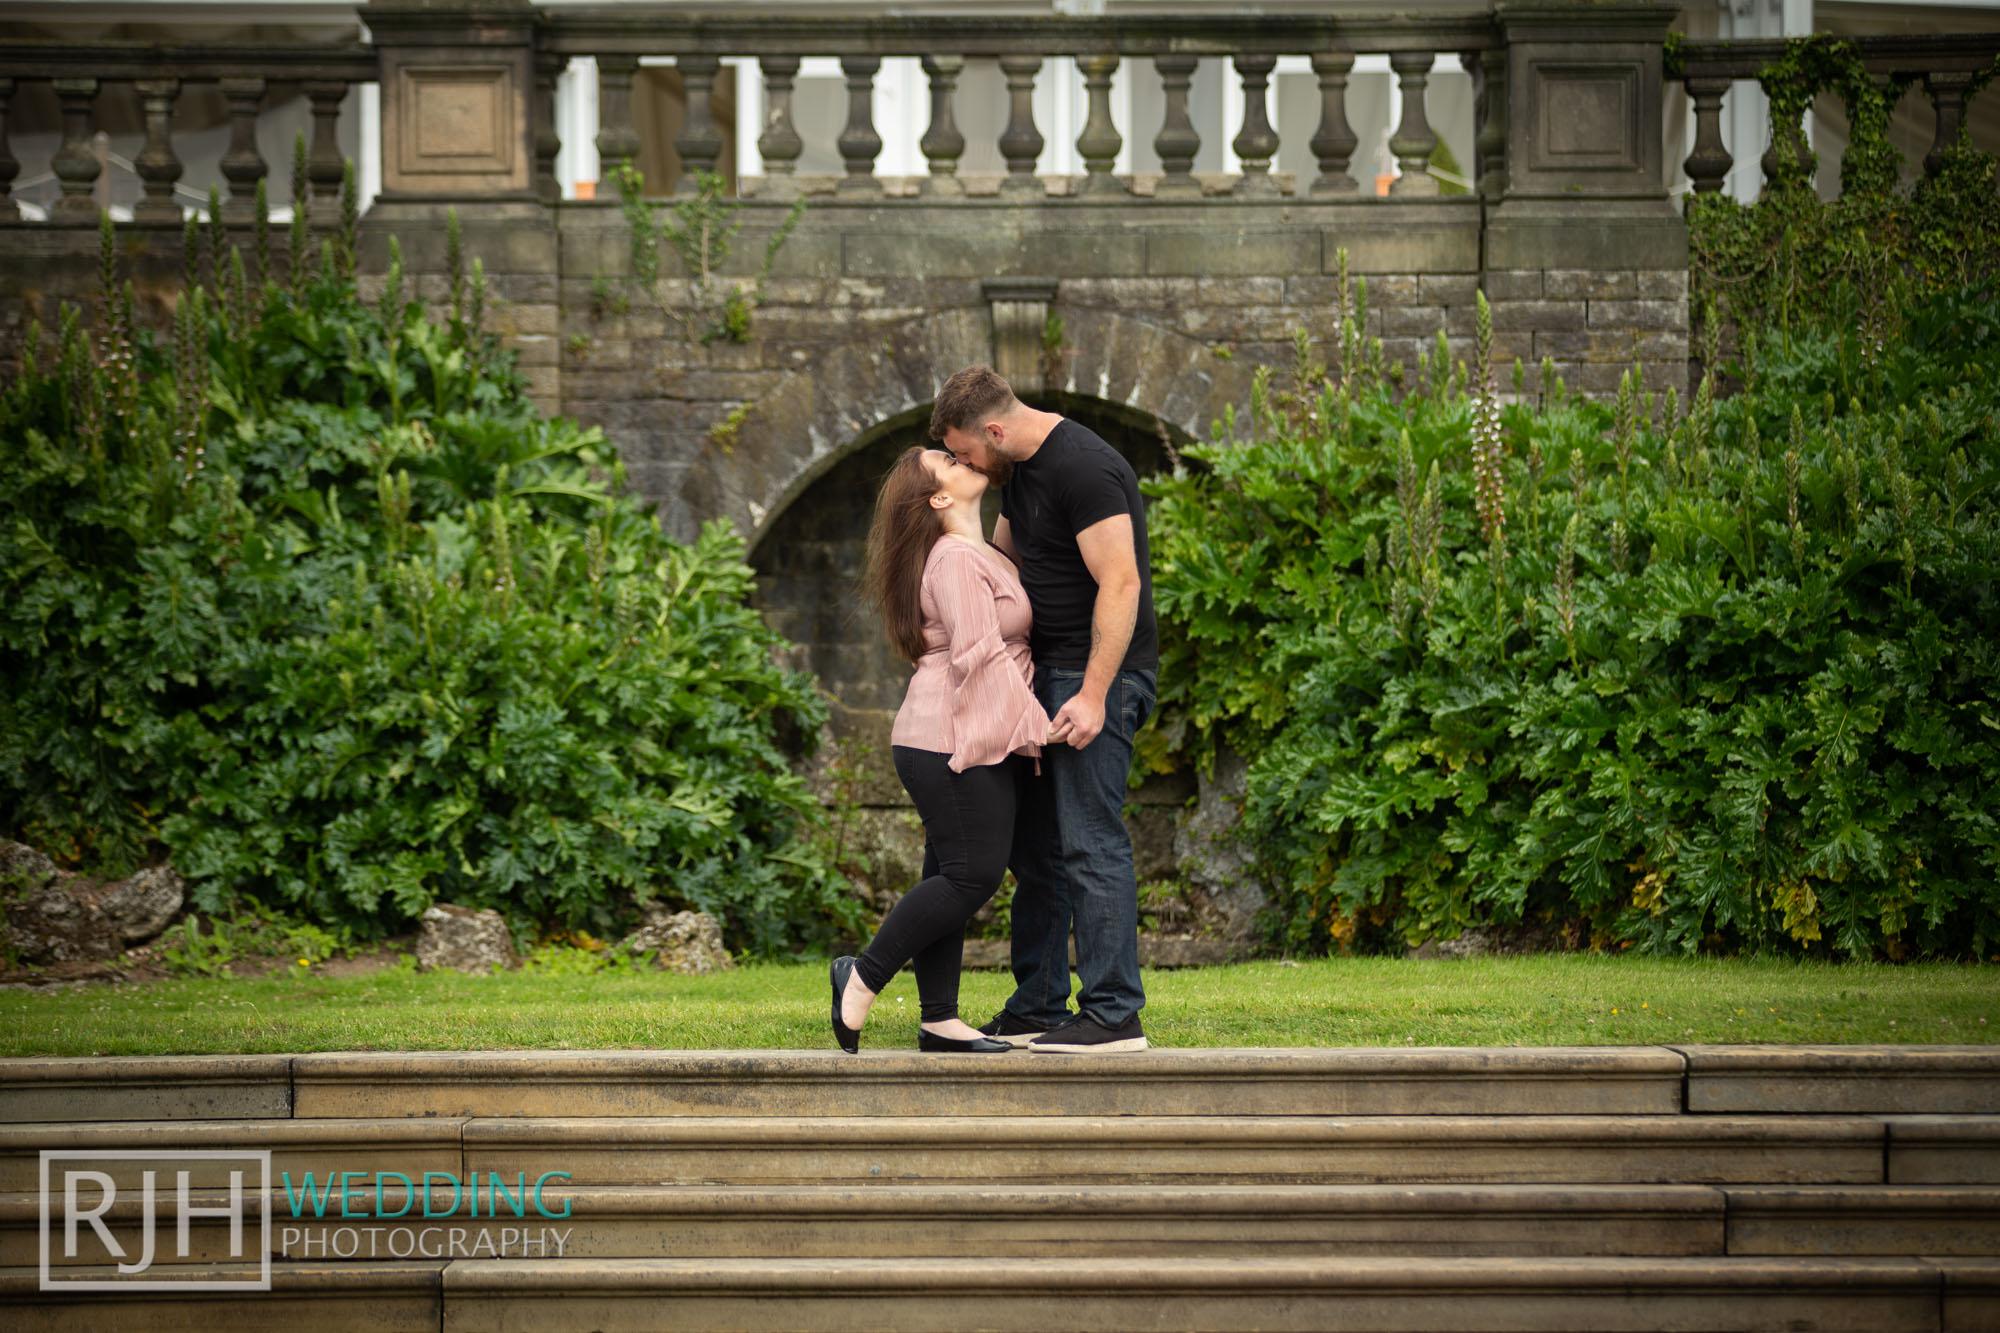 Osmaston Park Wedding Photographer - Jodie & Oli_030_IMG_7589.jpg